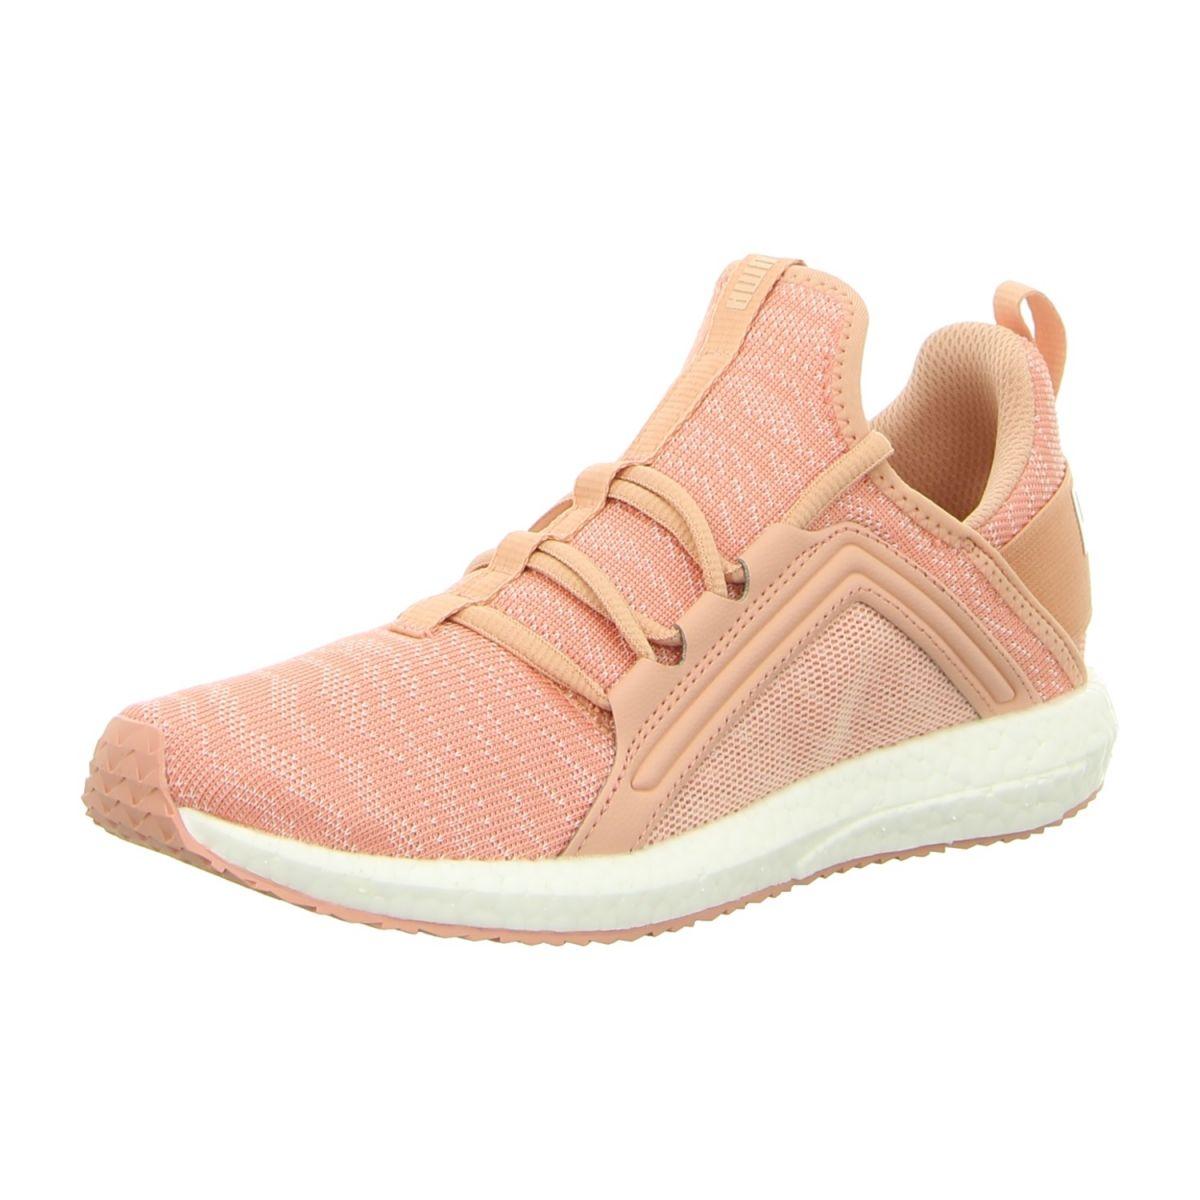 Scarpe Puma Sneaker Mega NRGY ZEBRA Wn 's Pearl Peach beige Rosa NUOVO